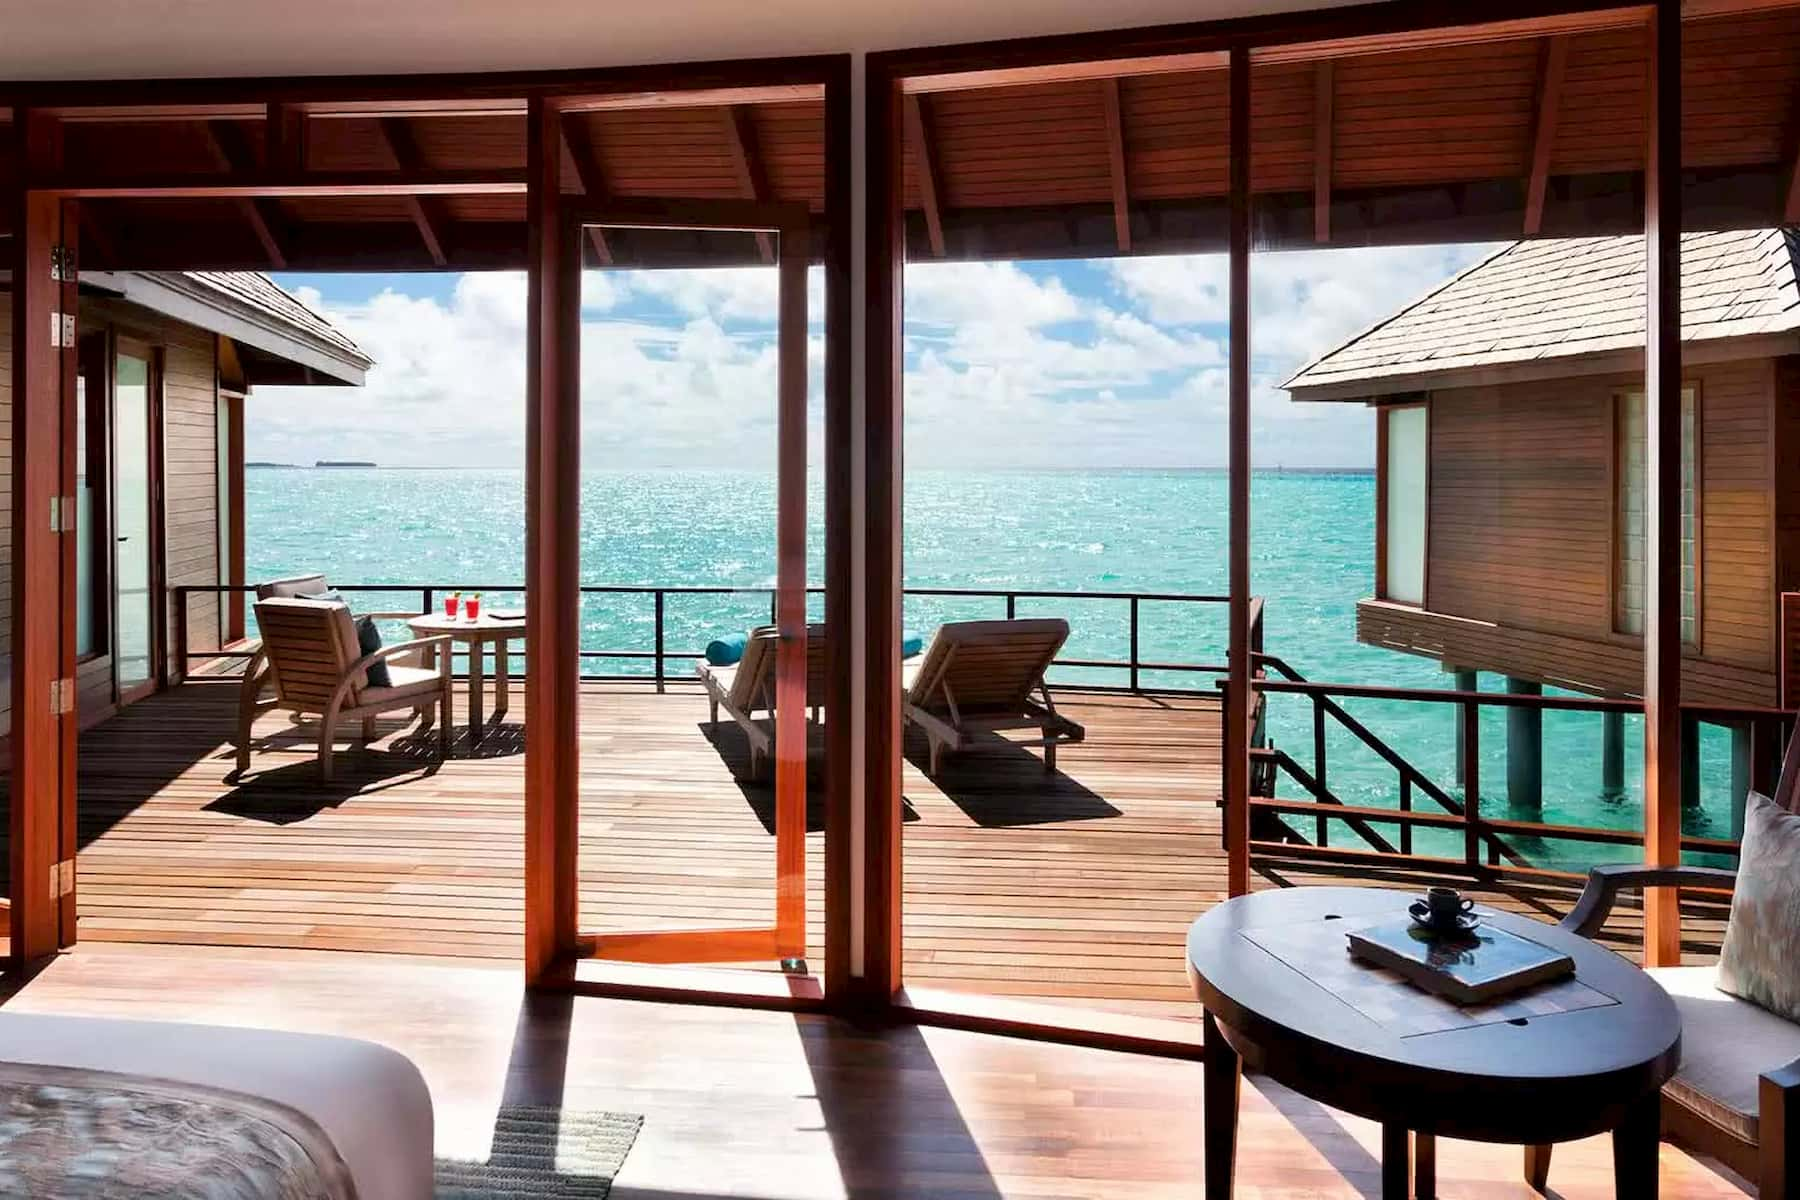 Anantara Dhigu resort Maldive overwater villa